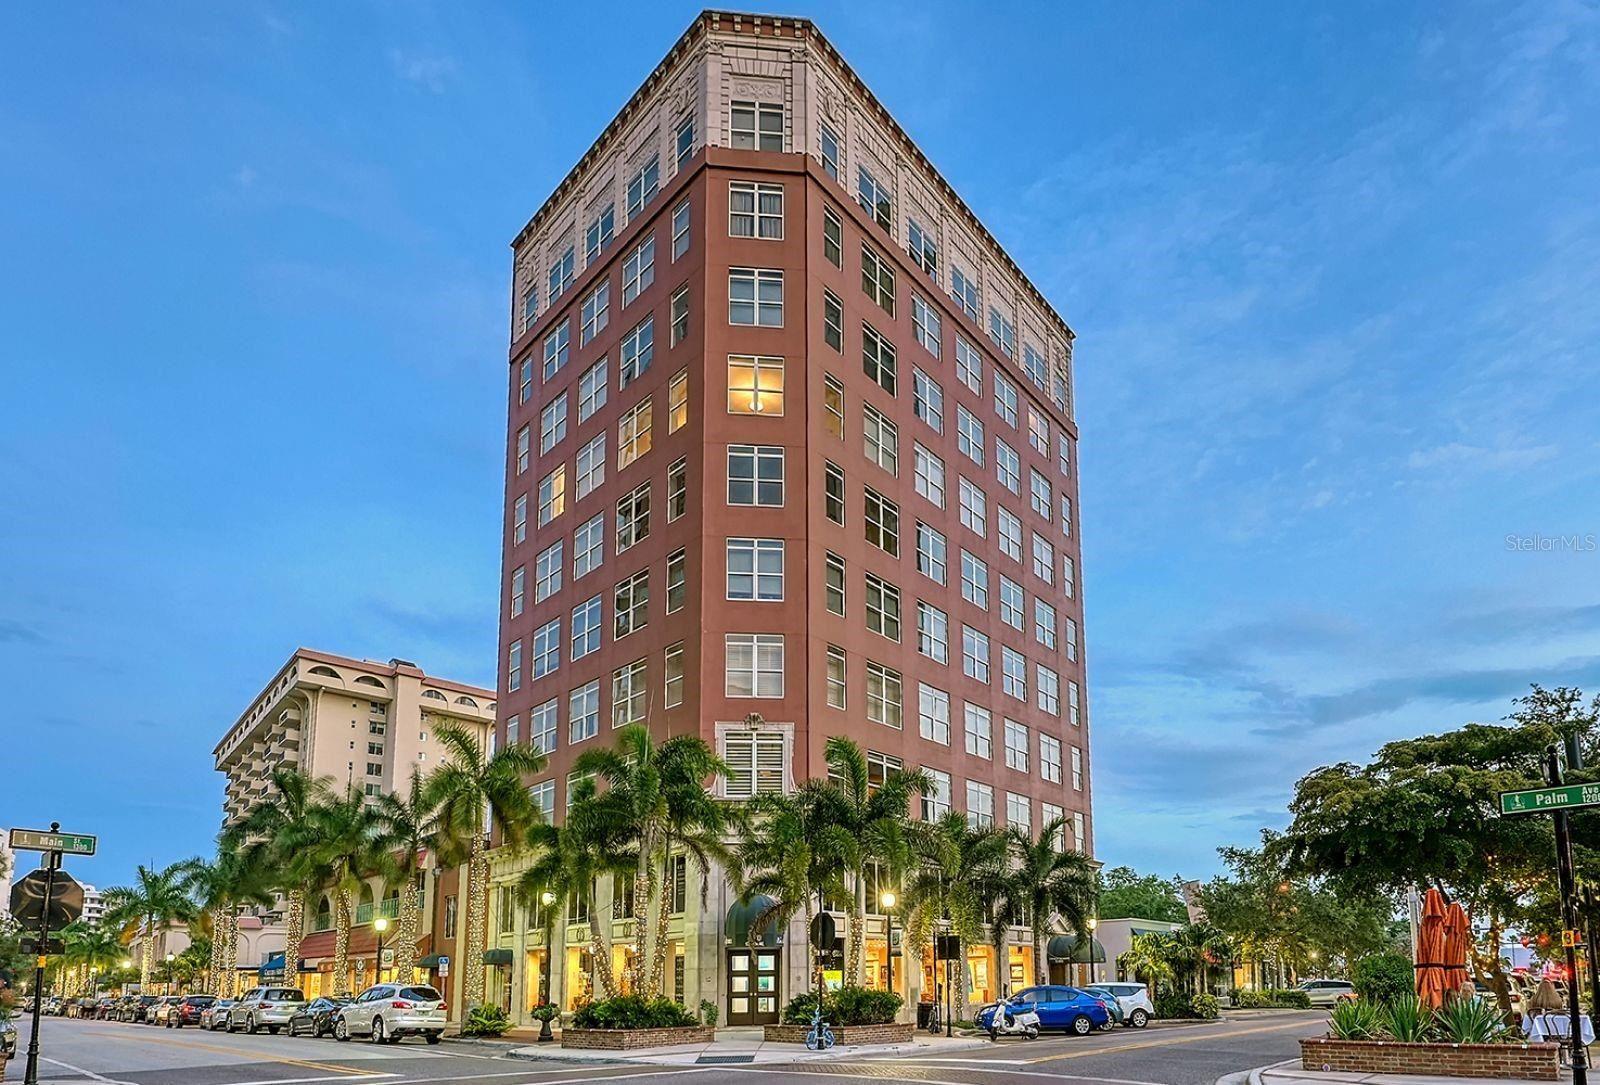 1330 MAIN STREET #7, Sarasota, FL 34236 - #: A4500993